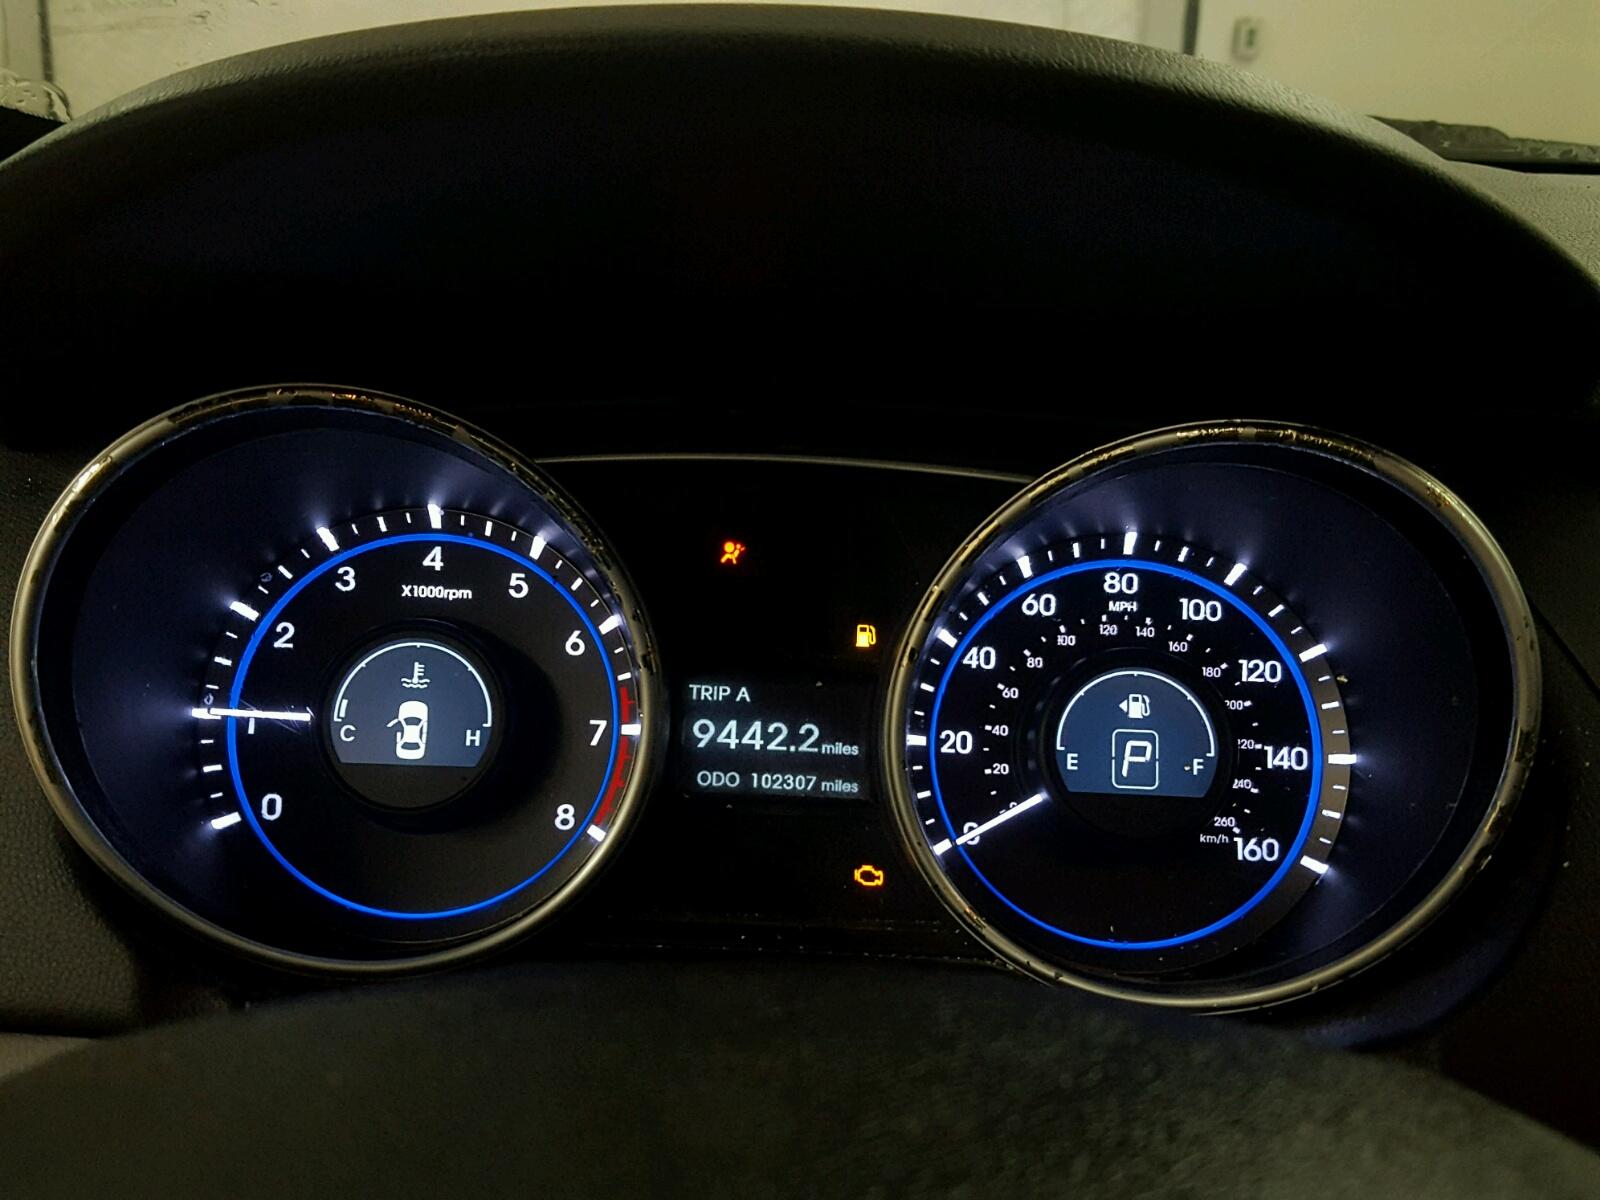 5NPEB4AC0BH181770 - 2011 Hyundai Sonata Gls 2.4L front view